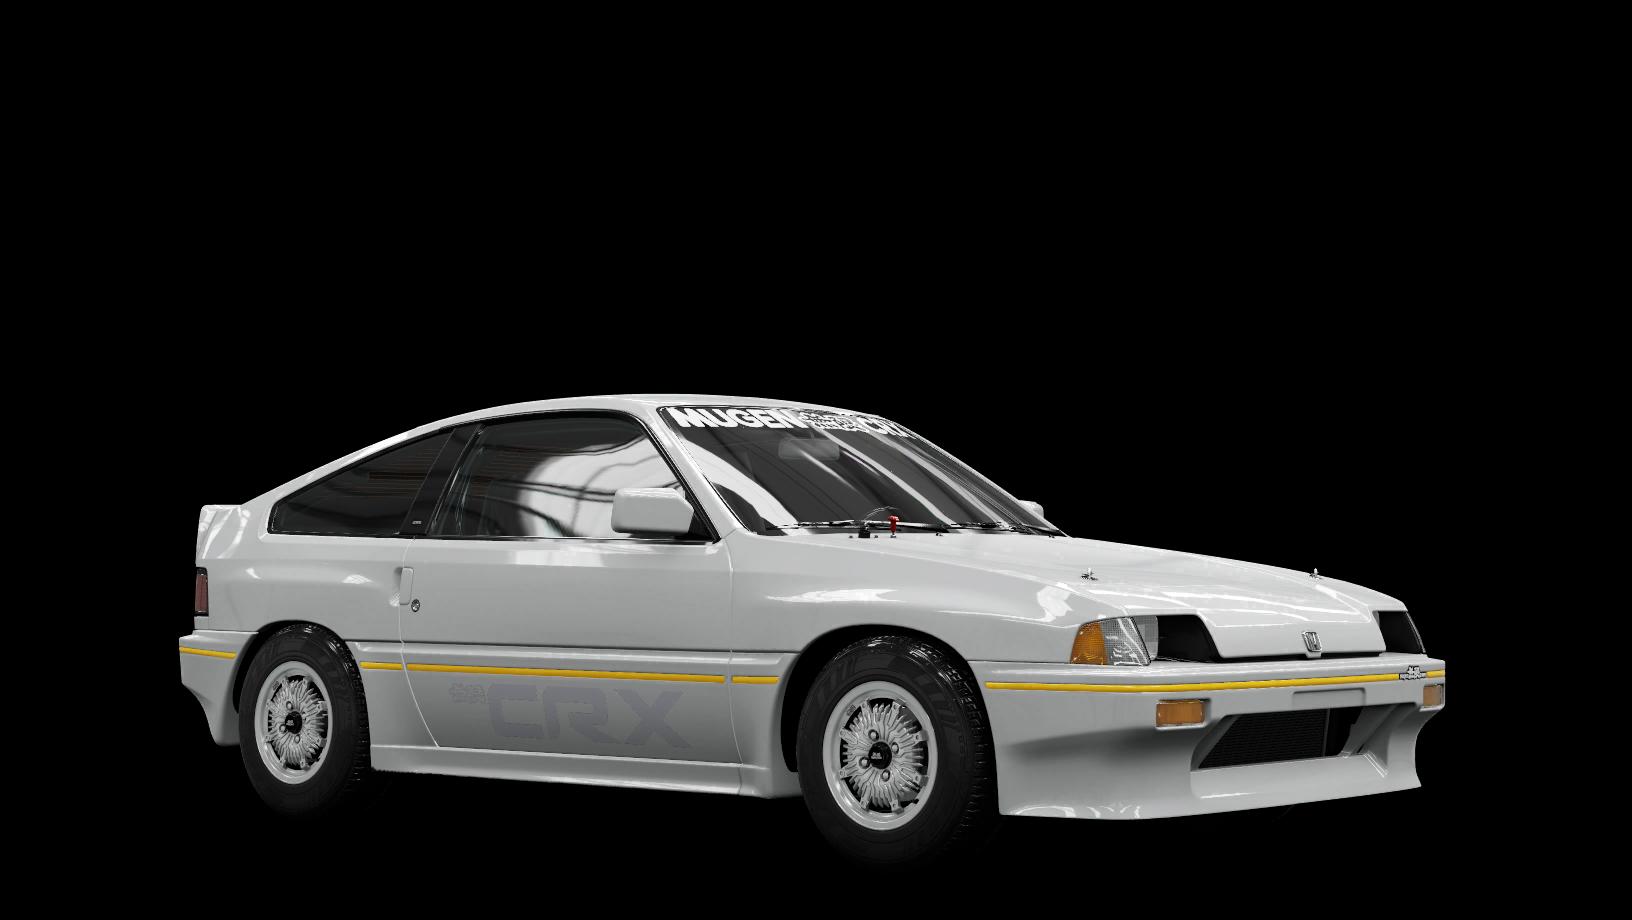 Honda Civic CRX Mugen